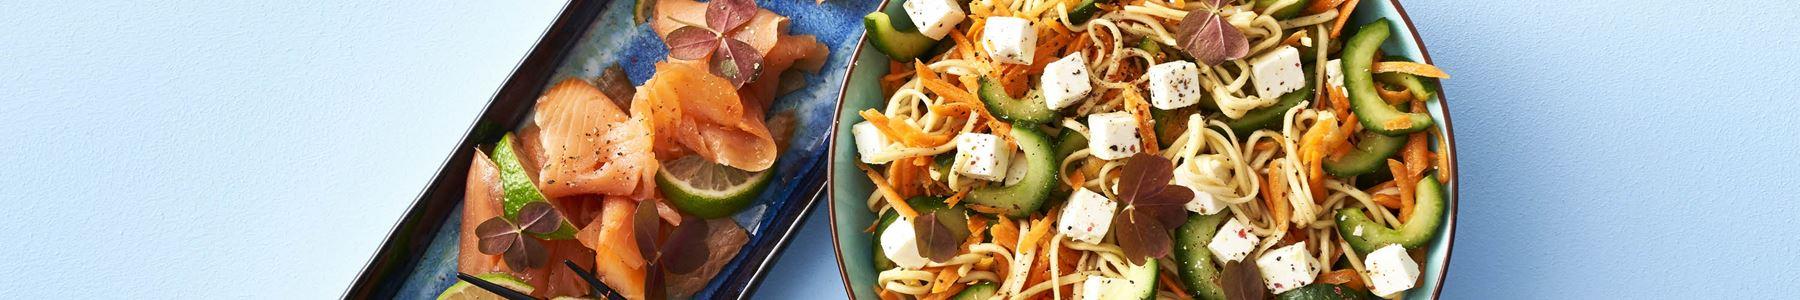 Hurtig + Gulerod + Salater + Nudler